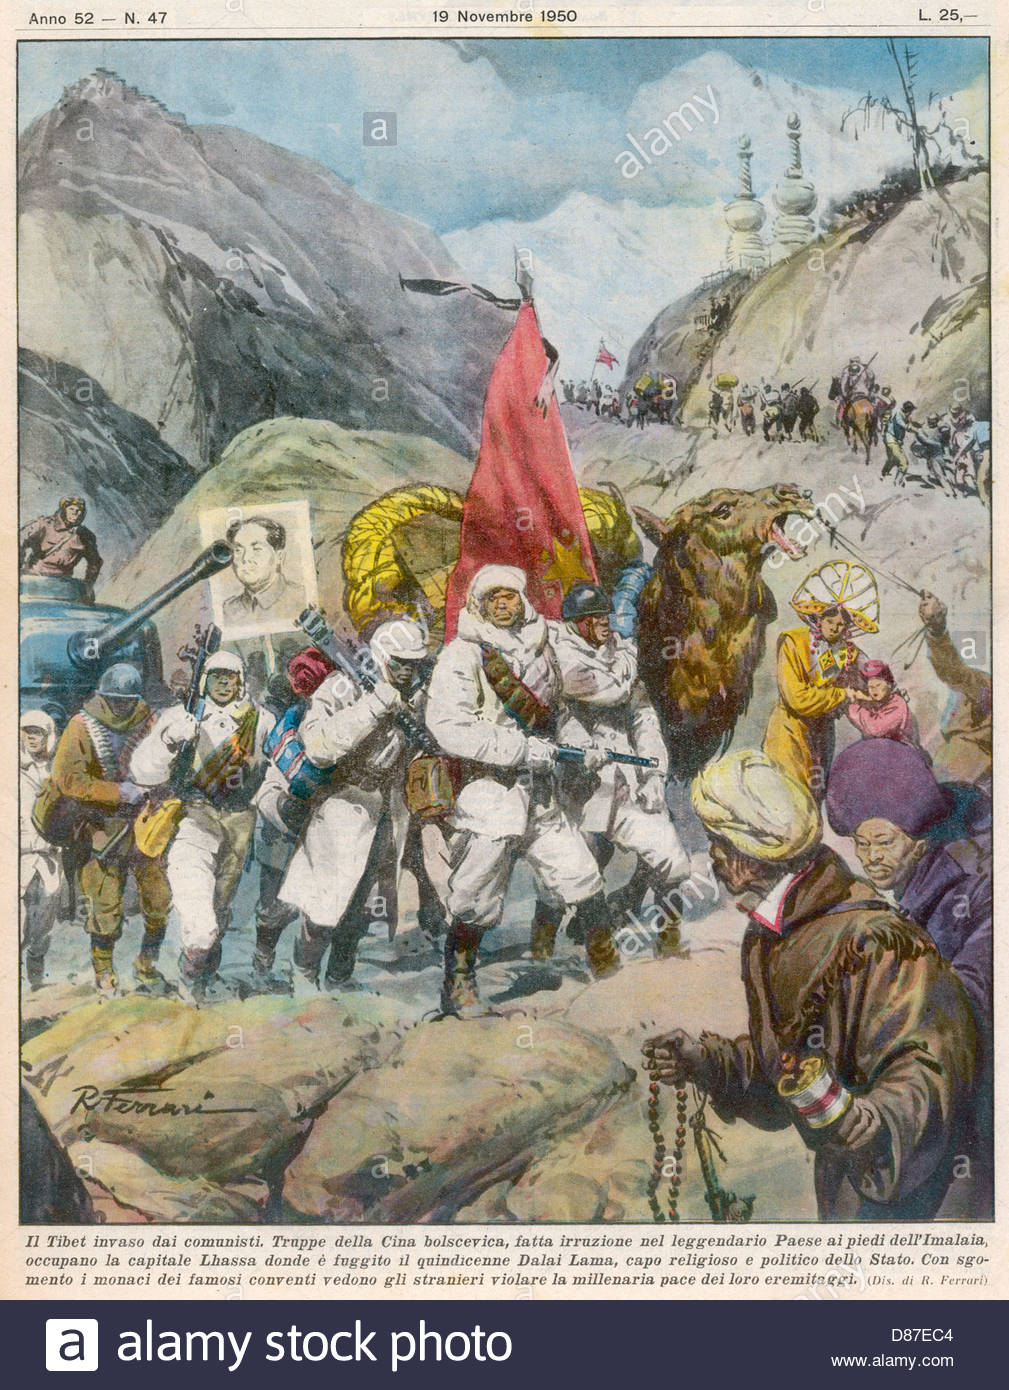 China Invades Tibet 1950 - Stock Image